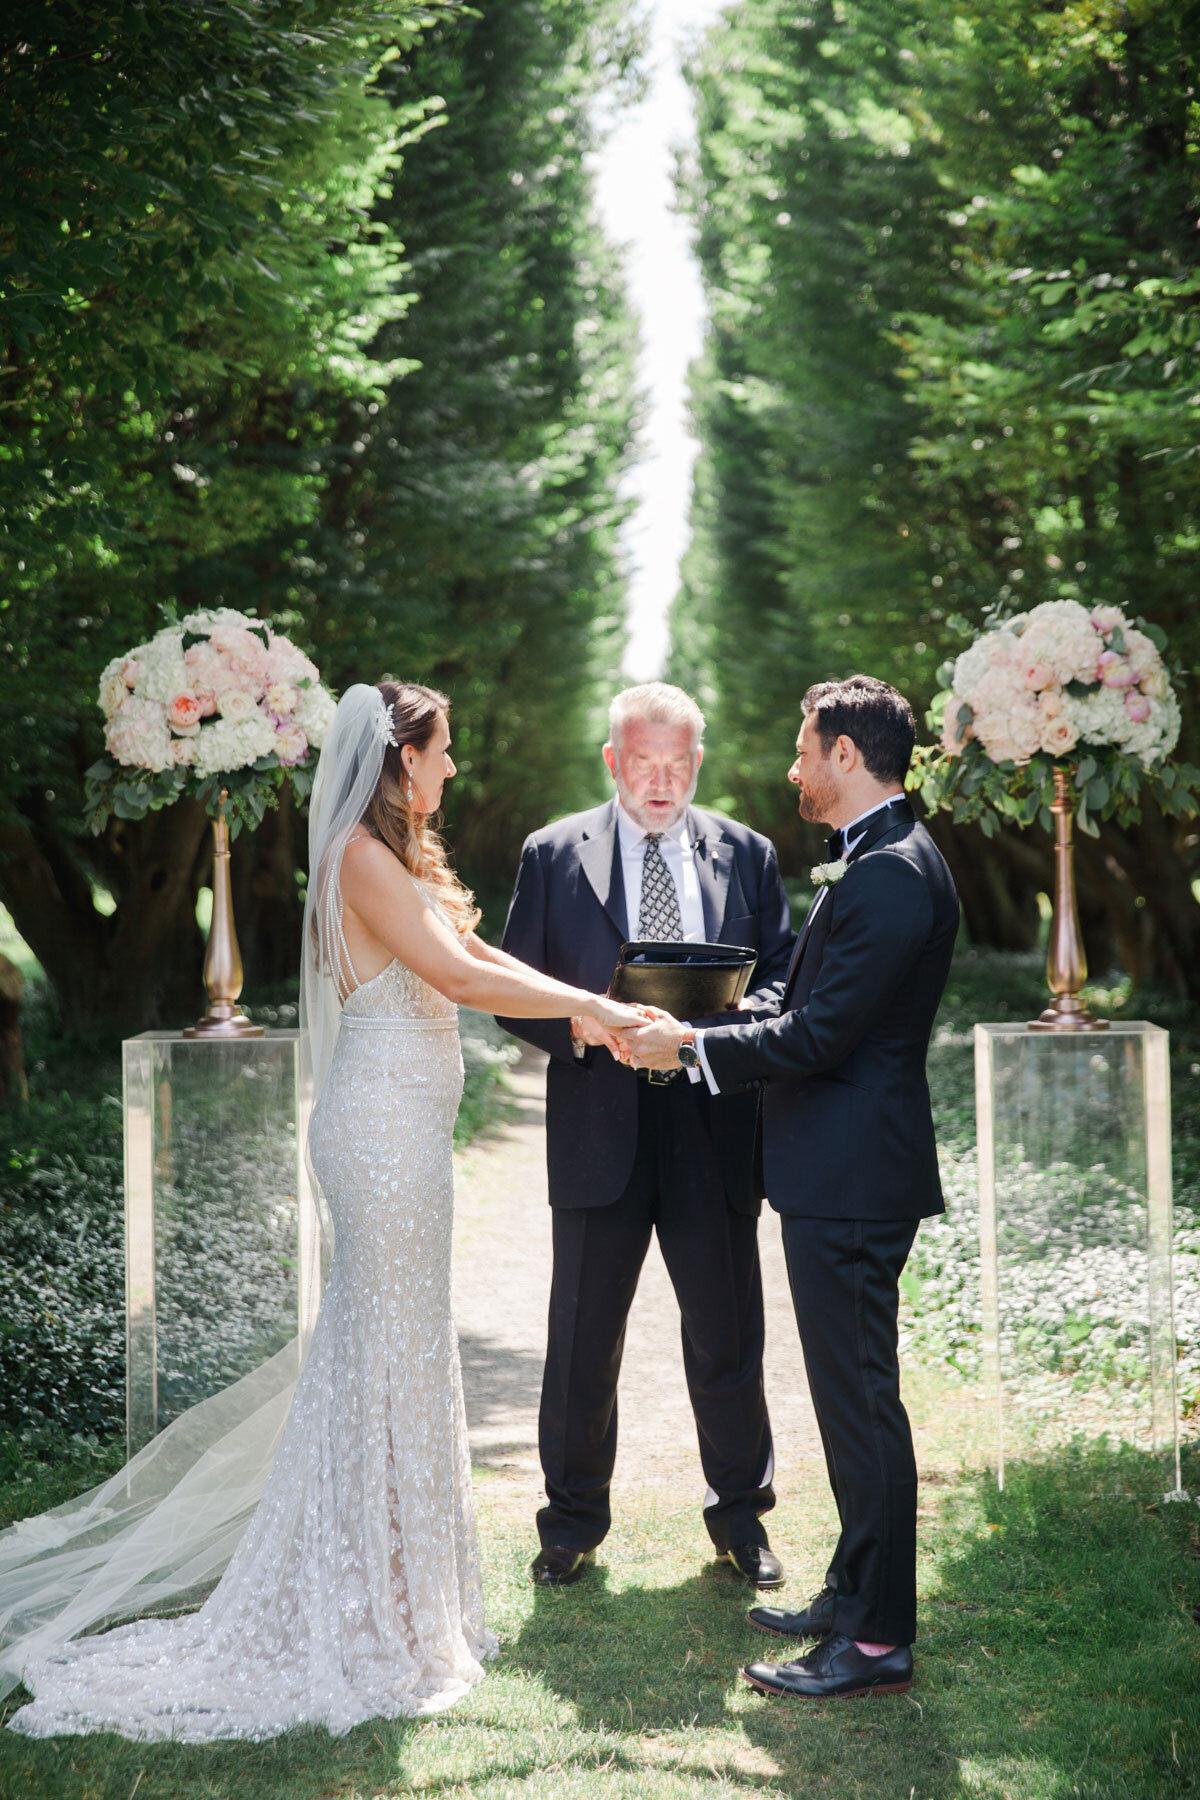 Chateau-des-Charmes-Wedding-Summer-Vineyard-Bride-Niagara-on-the-Lake-photos-by-Gemini-Photography-Ontario-0018.jpg